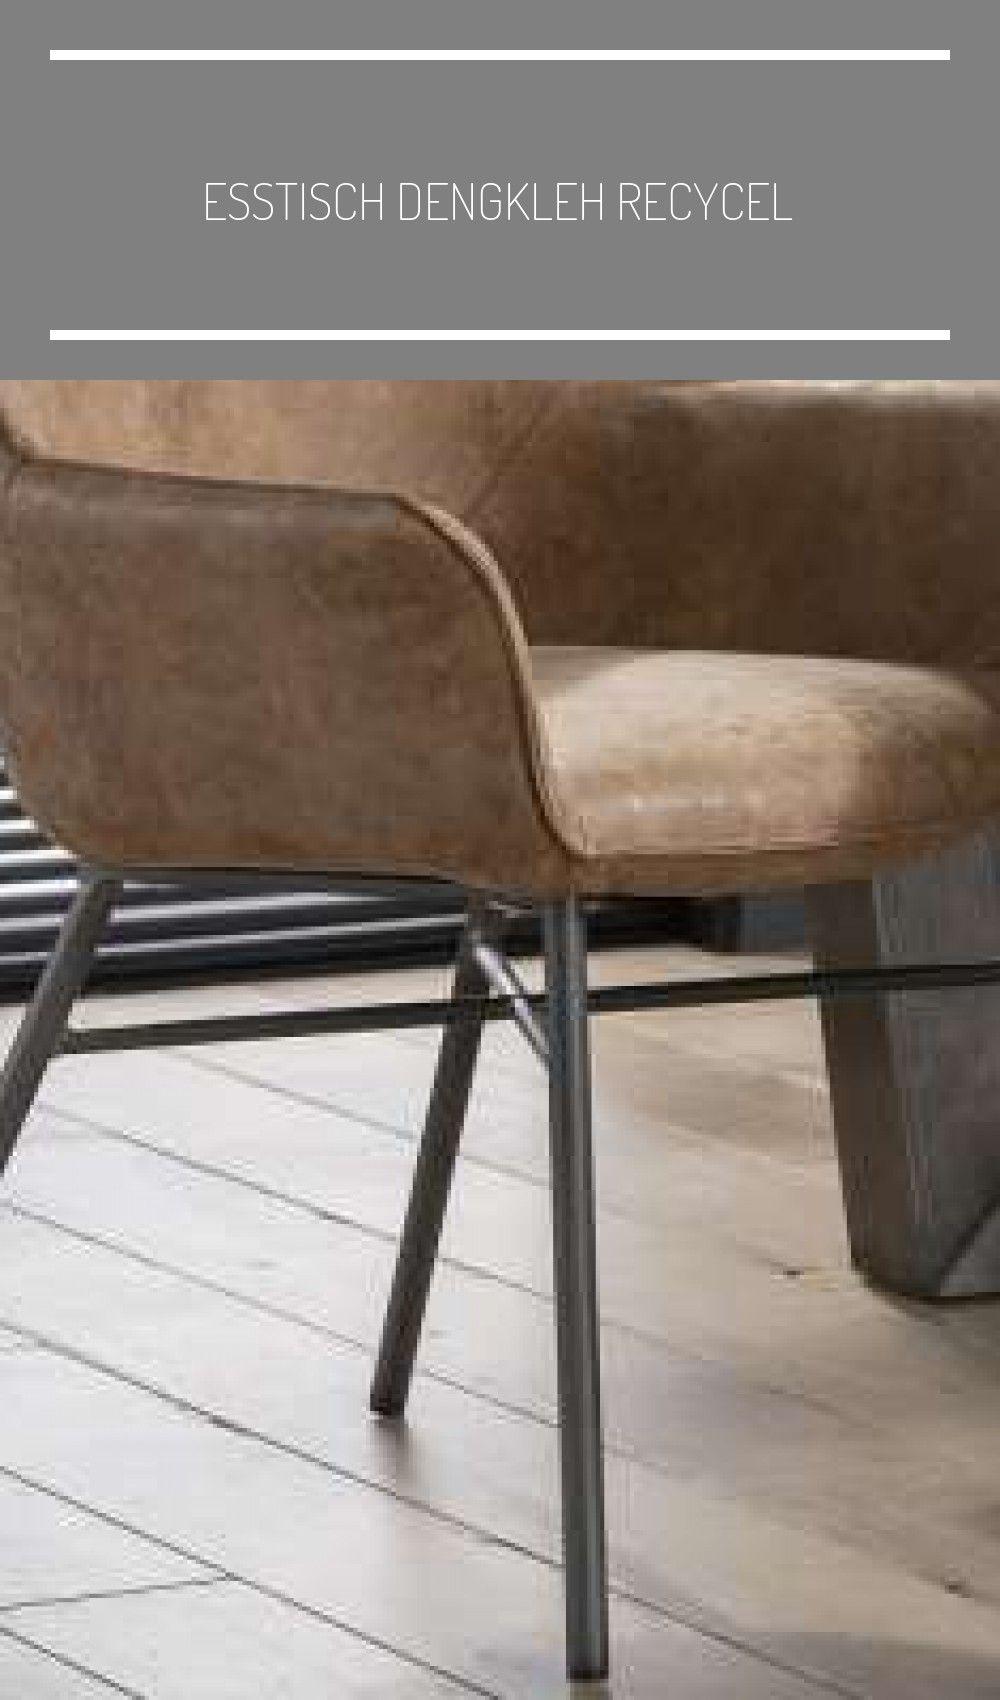 Esstisch Dengkleh Recyceltes Teakholz Braun Auswahl 1 X Esstisch Dengkleh Recyceltes Teakholz Braun Material Recyceltes Teakholz Fa In 2020 Furniture Home Home Decor